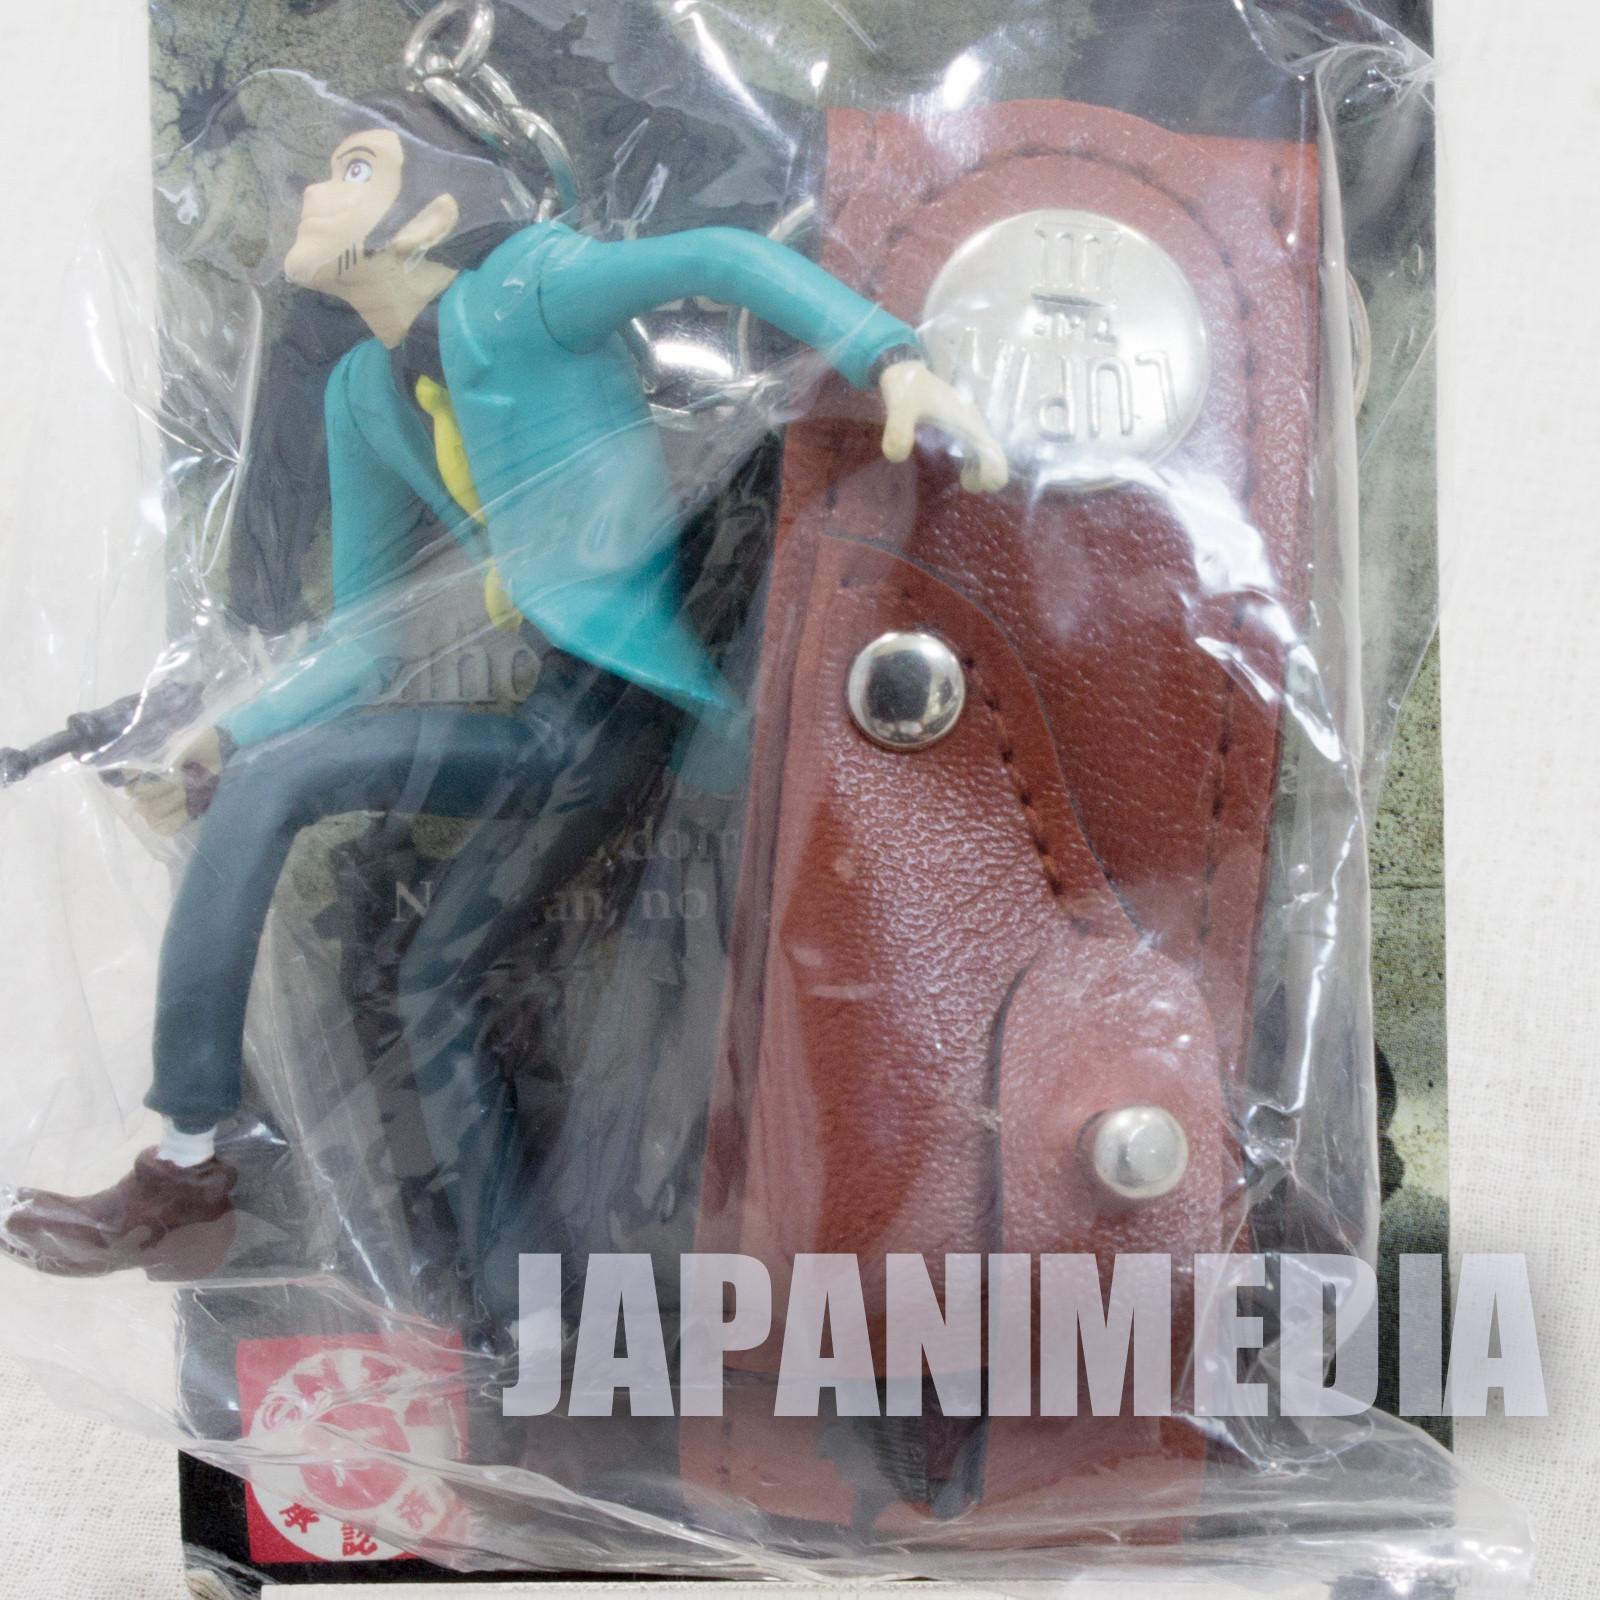 Lupin the Third (3rd) LUPIN Figure Holster Belt Strap Banpresto JAPAN